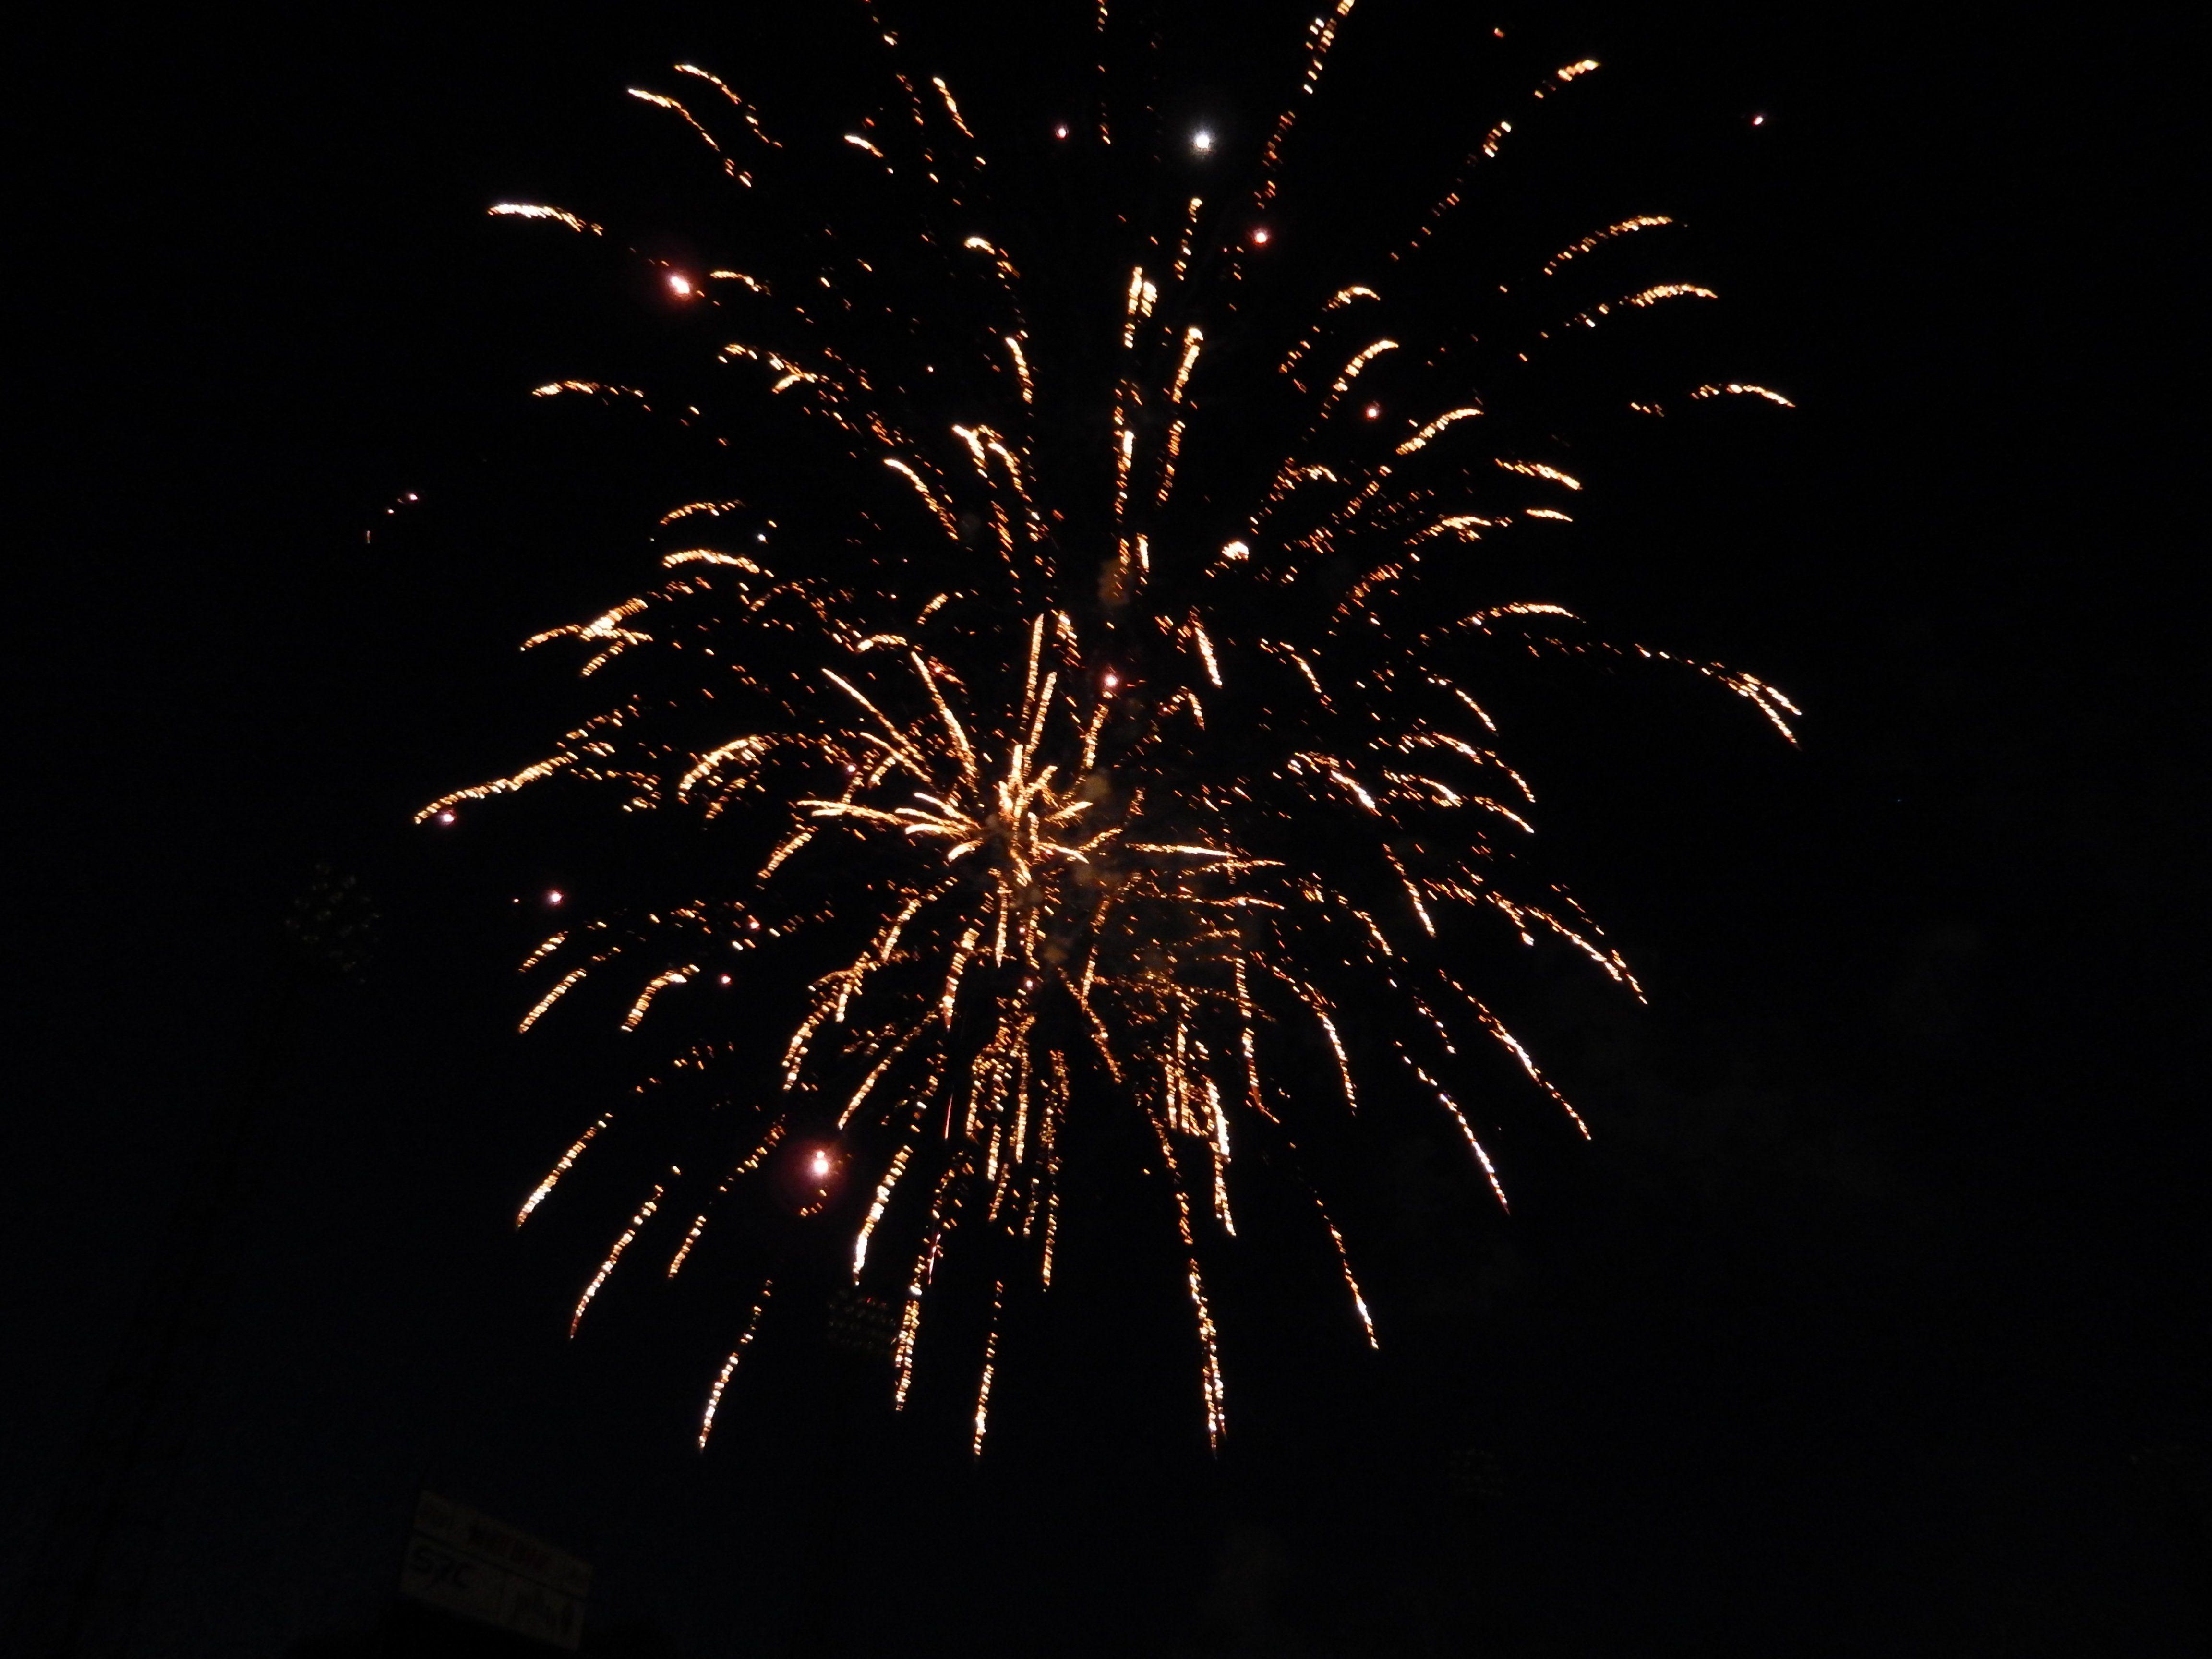 watkins glen fireworks 2020